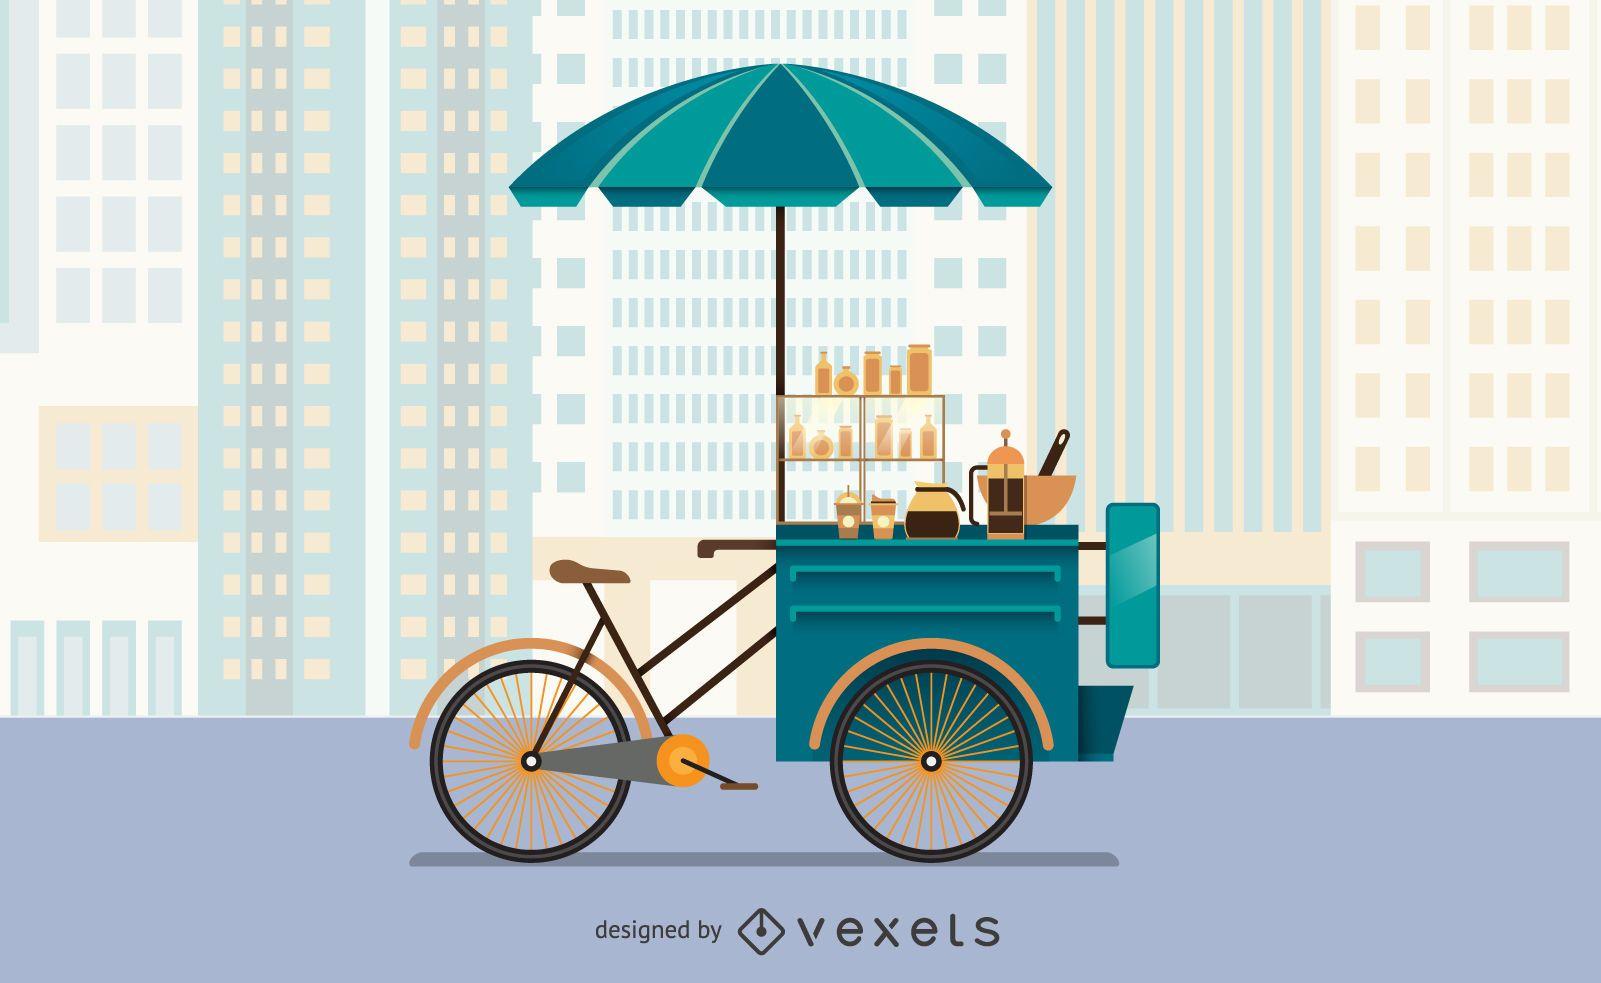 Ilustración de carrito de comida de bicicleta